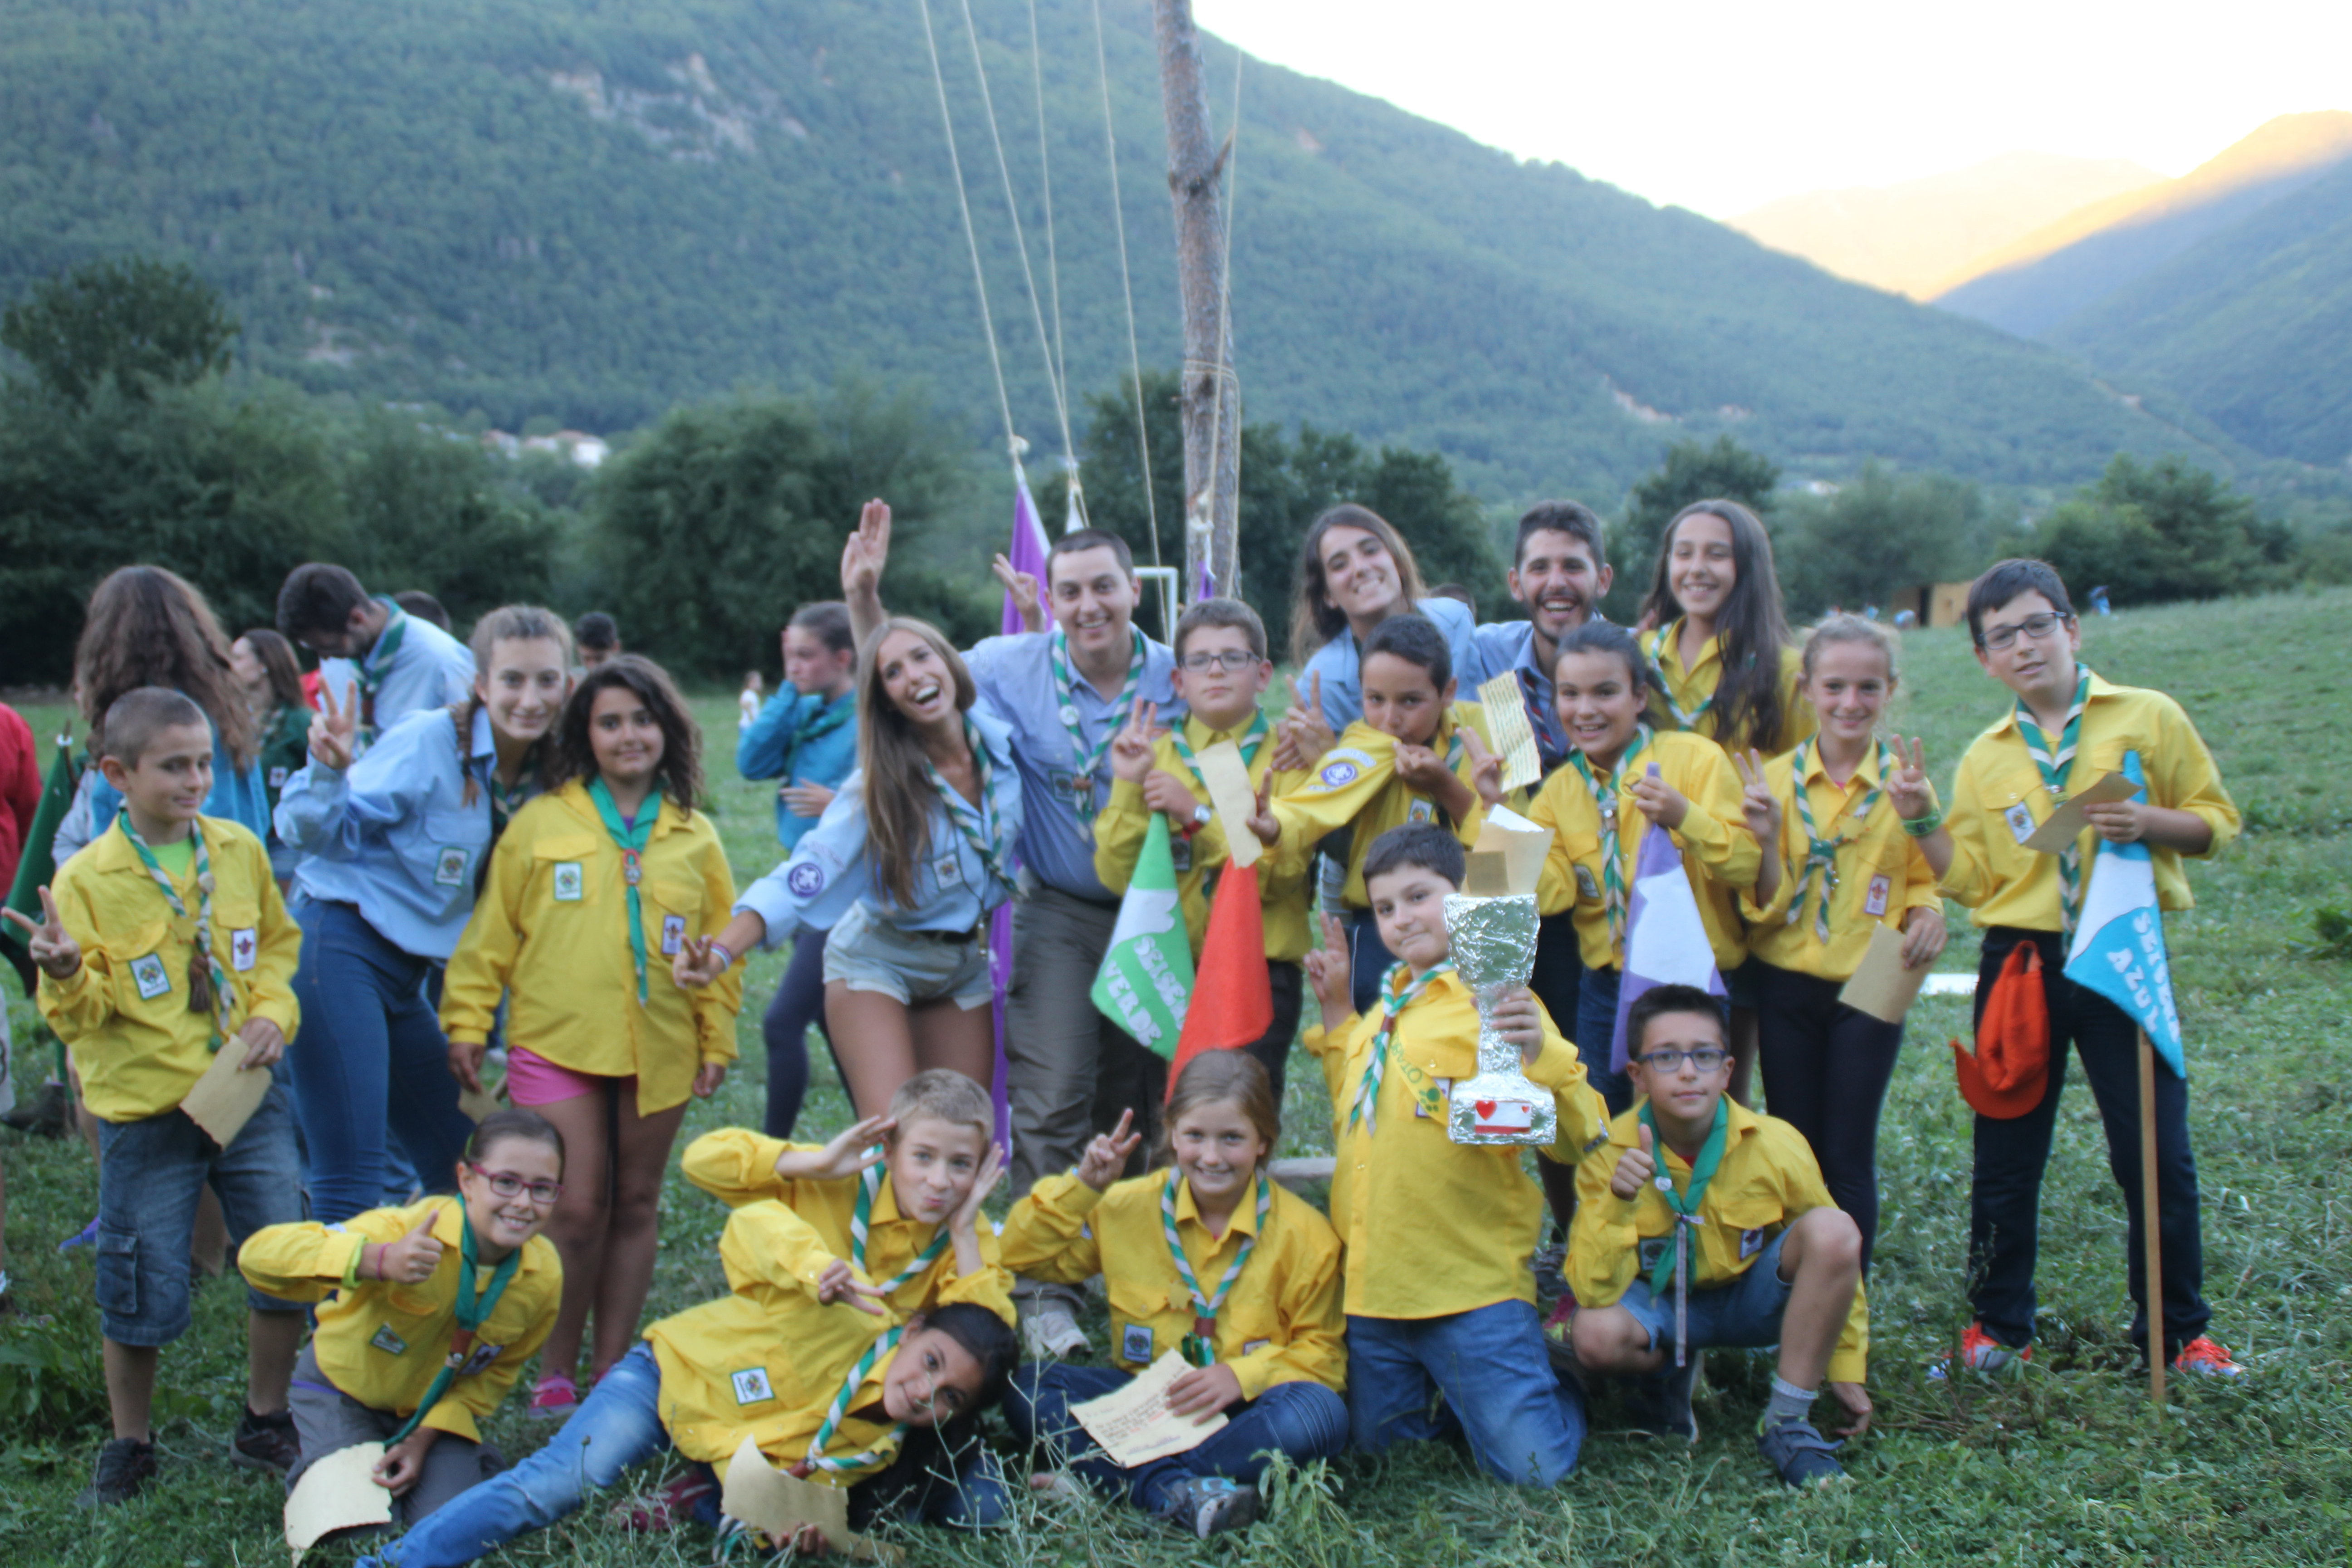 15-16 - Grupo - Campamento de verano - P415